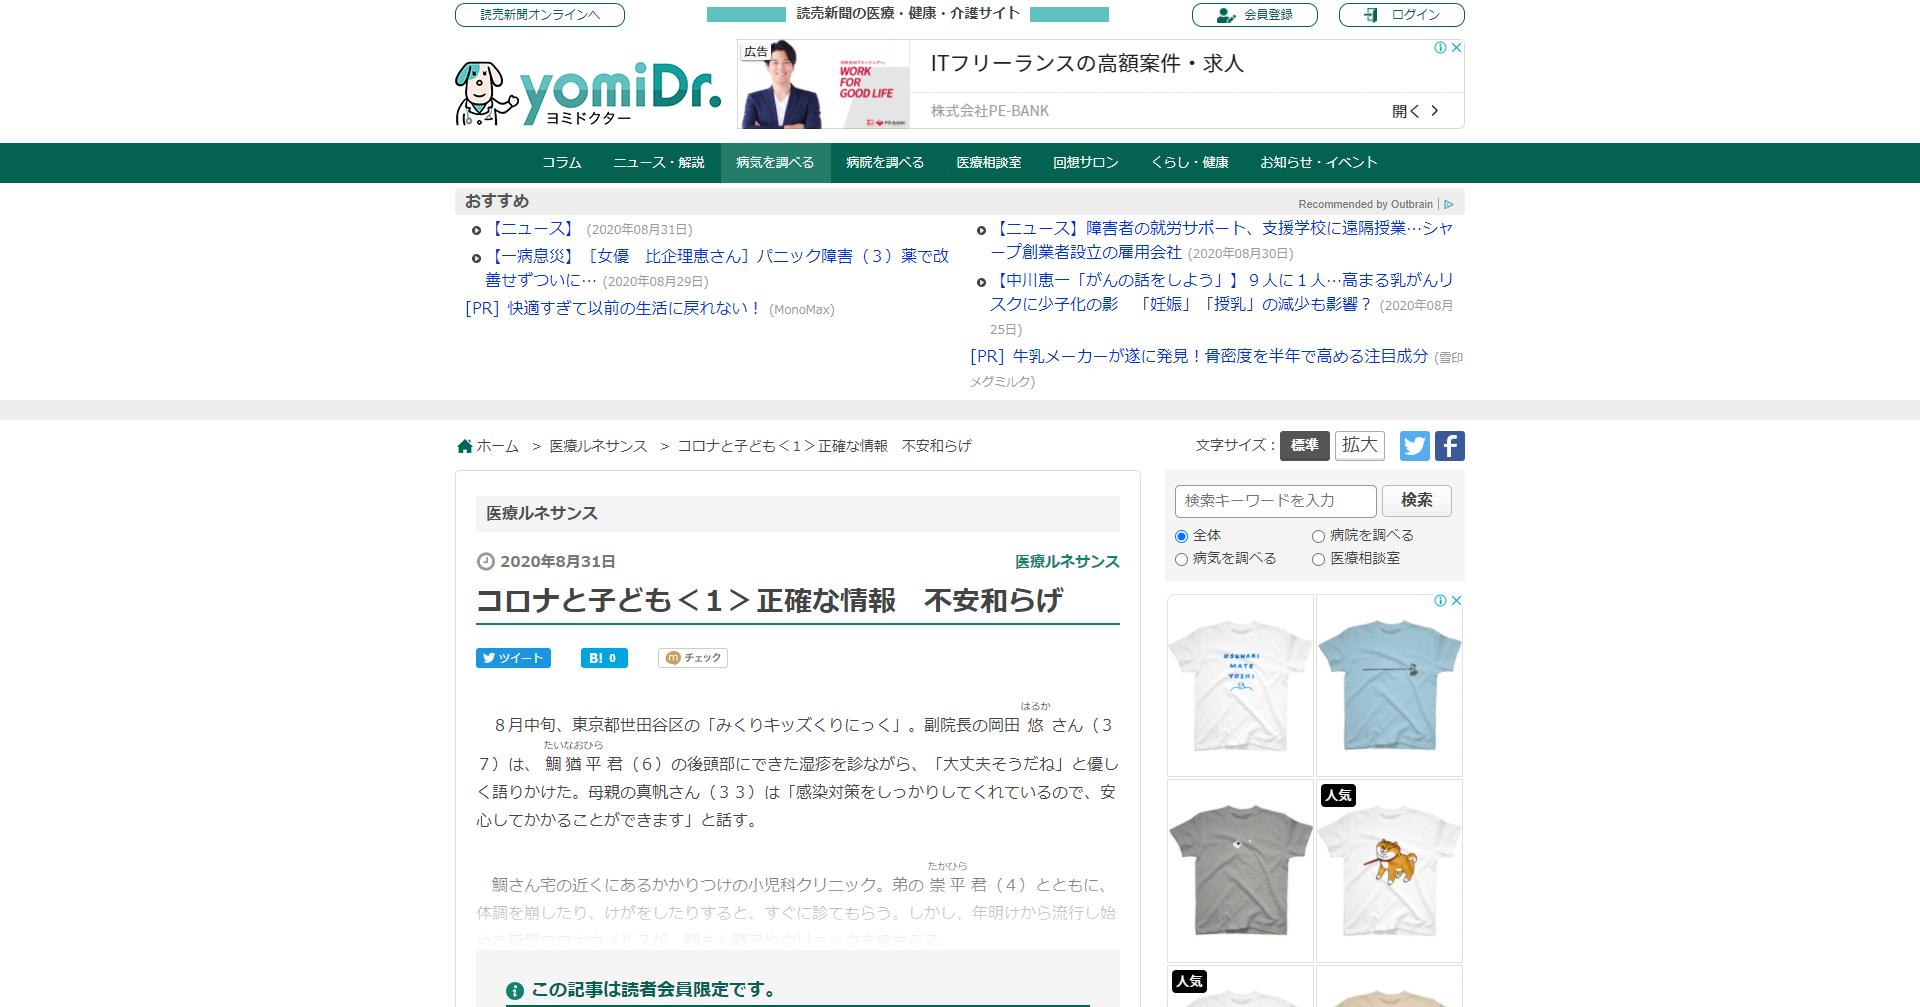 FireShot Capture 912 - コロナと子ども<1>正確な情報 不安和らげ _ yomiDr._ヨミドクター(読売新聞) - yomidr.yomiuri.co.jp